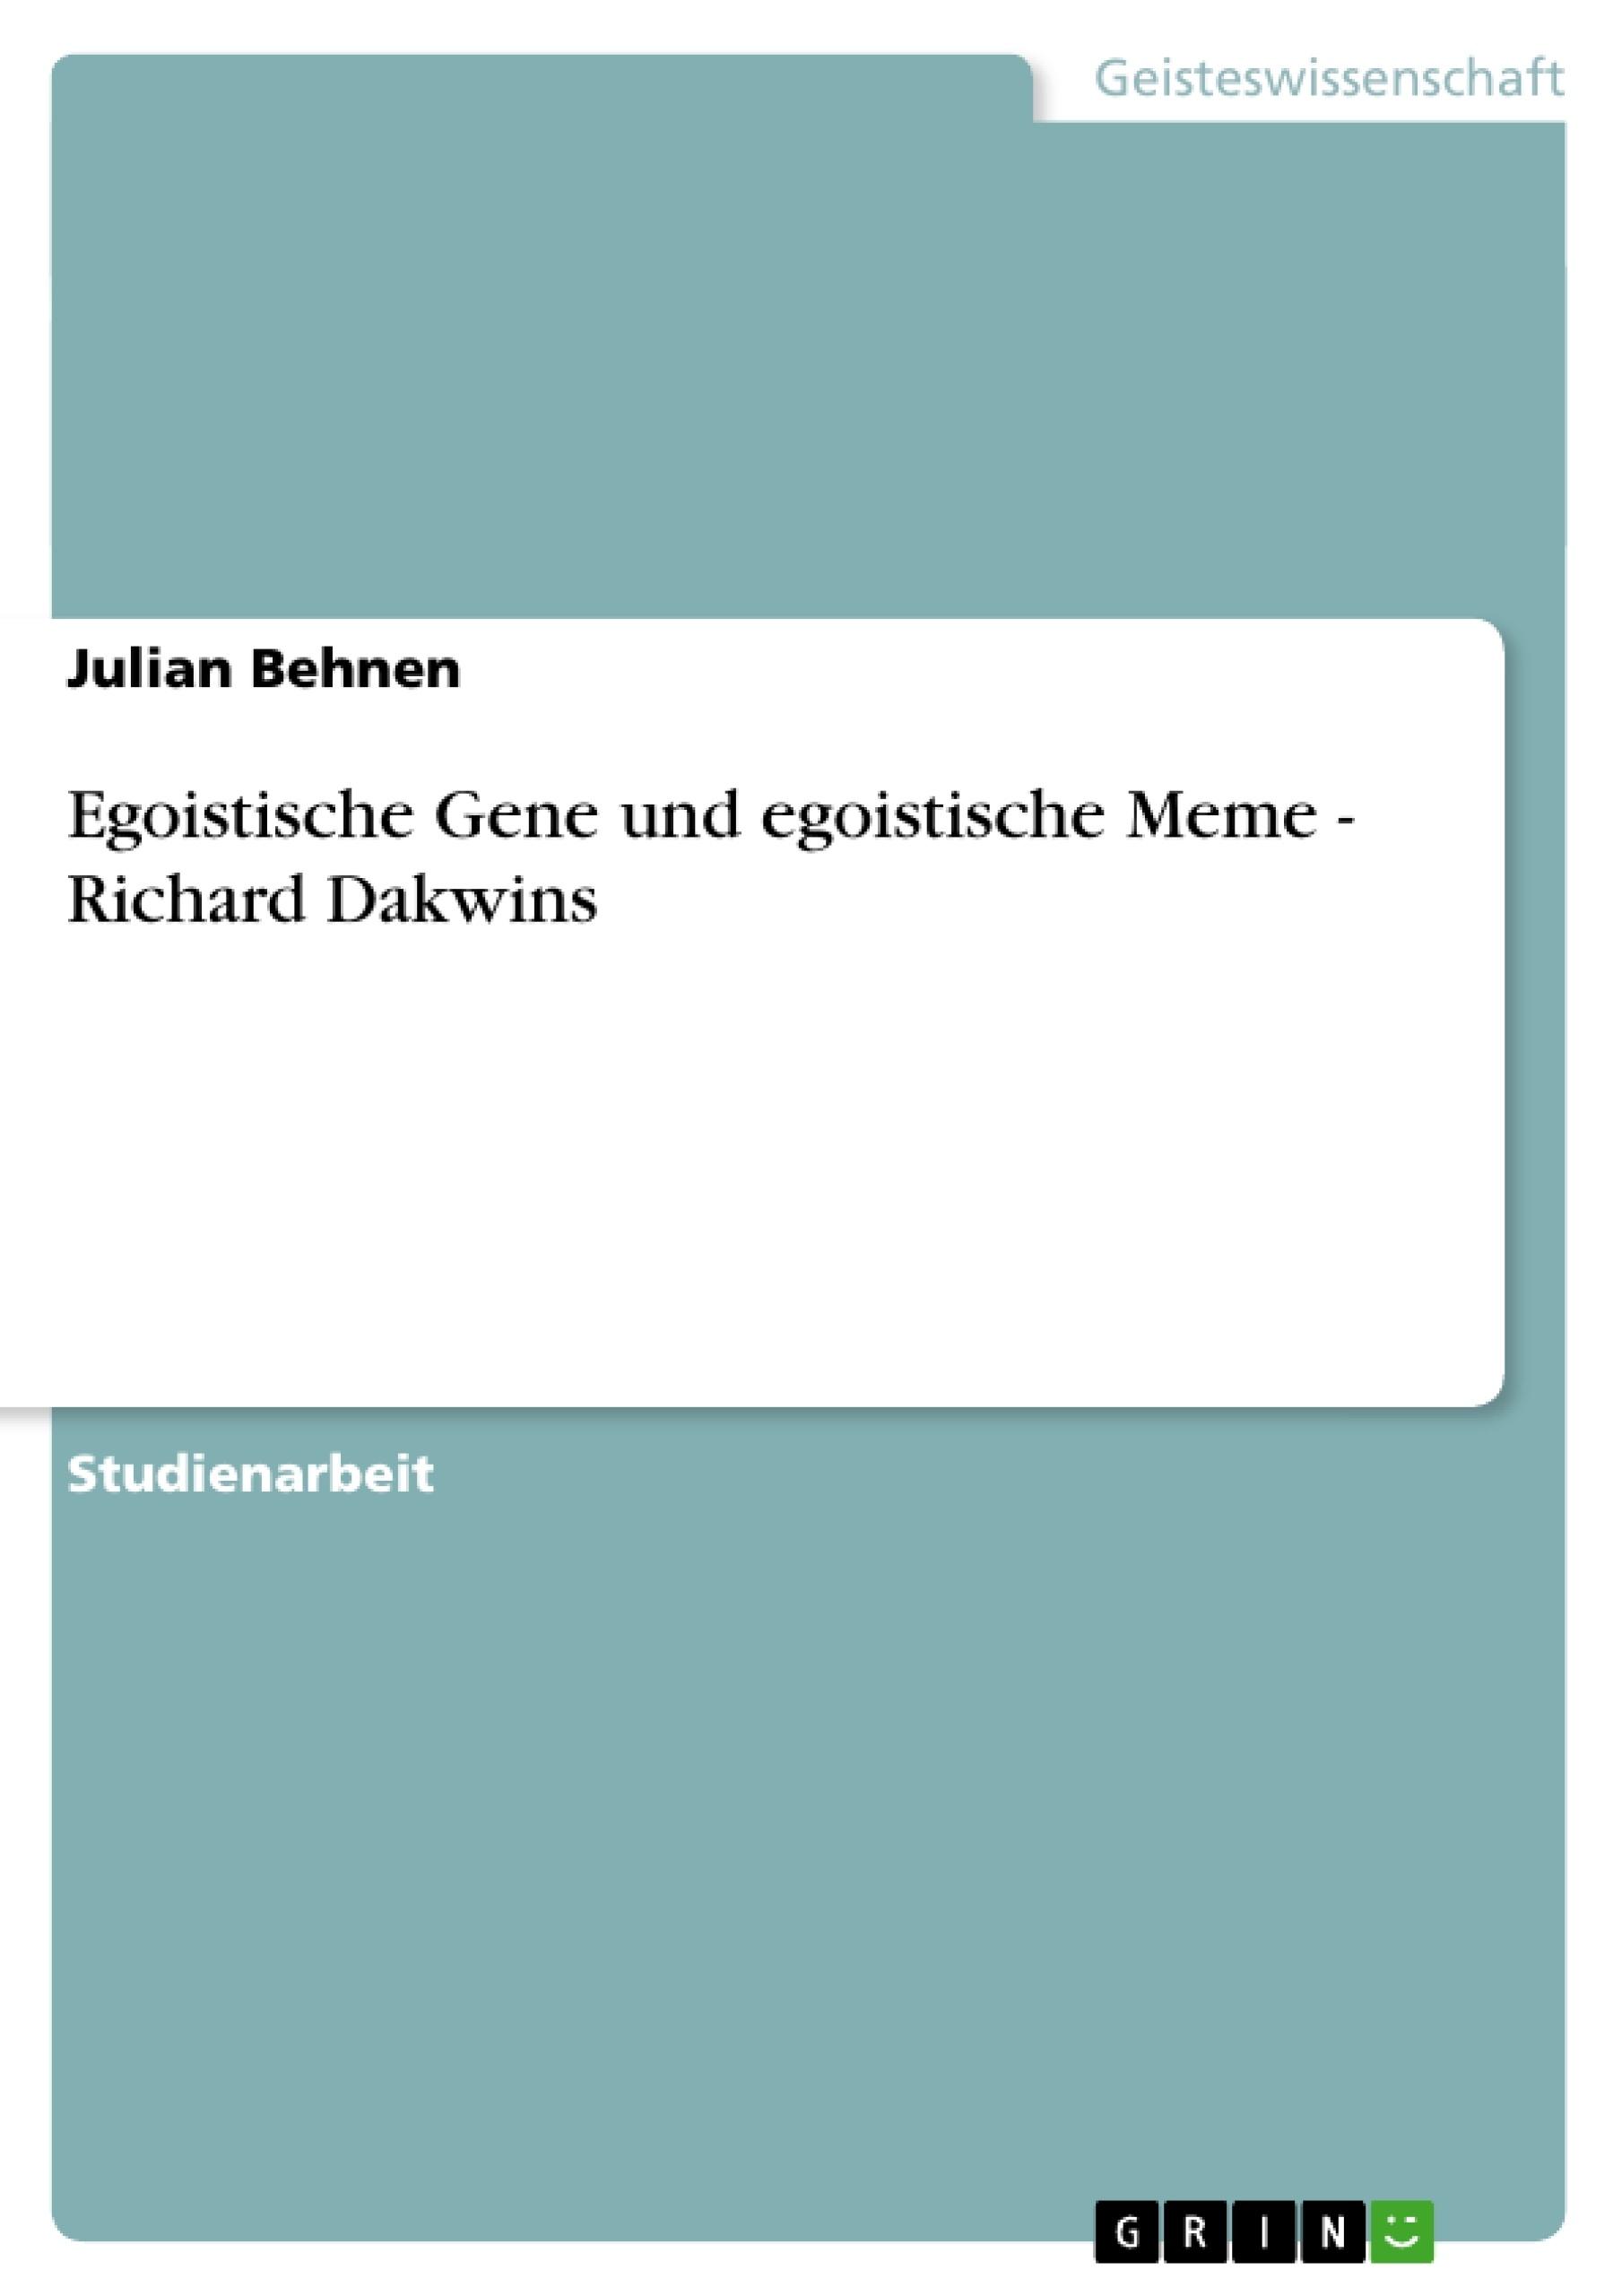 Titel: Egoistische Gene und egoistische Meme - Richard Dakwins